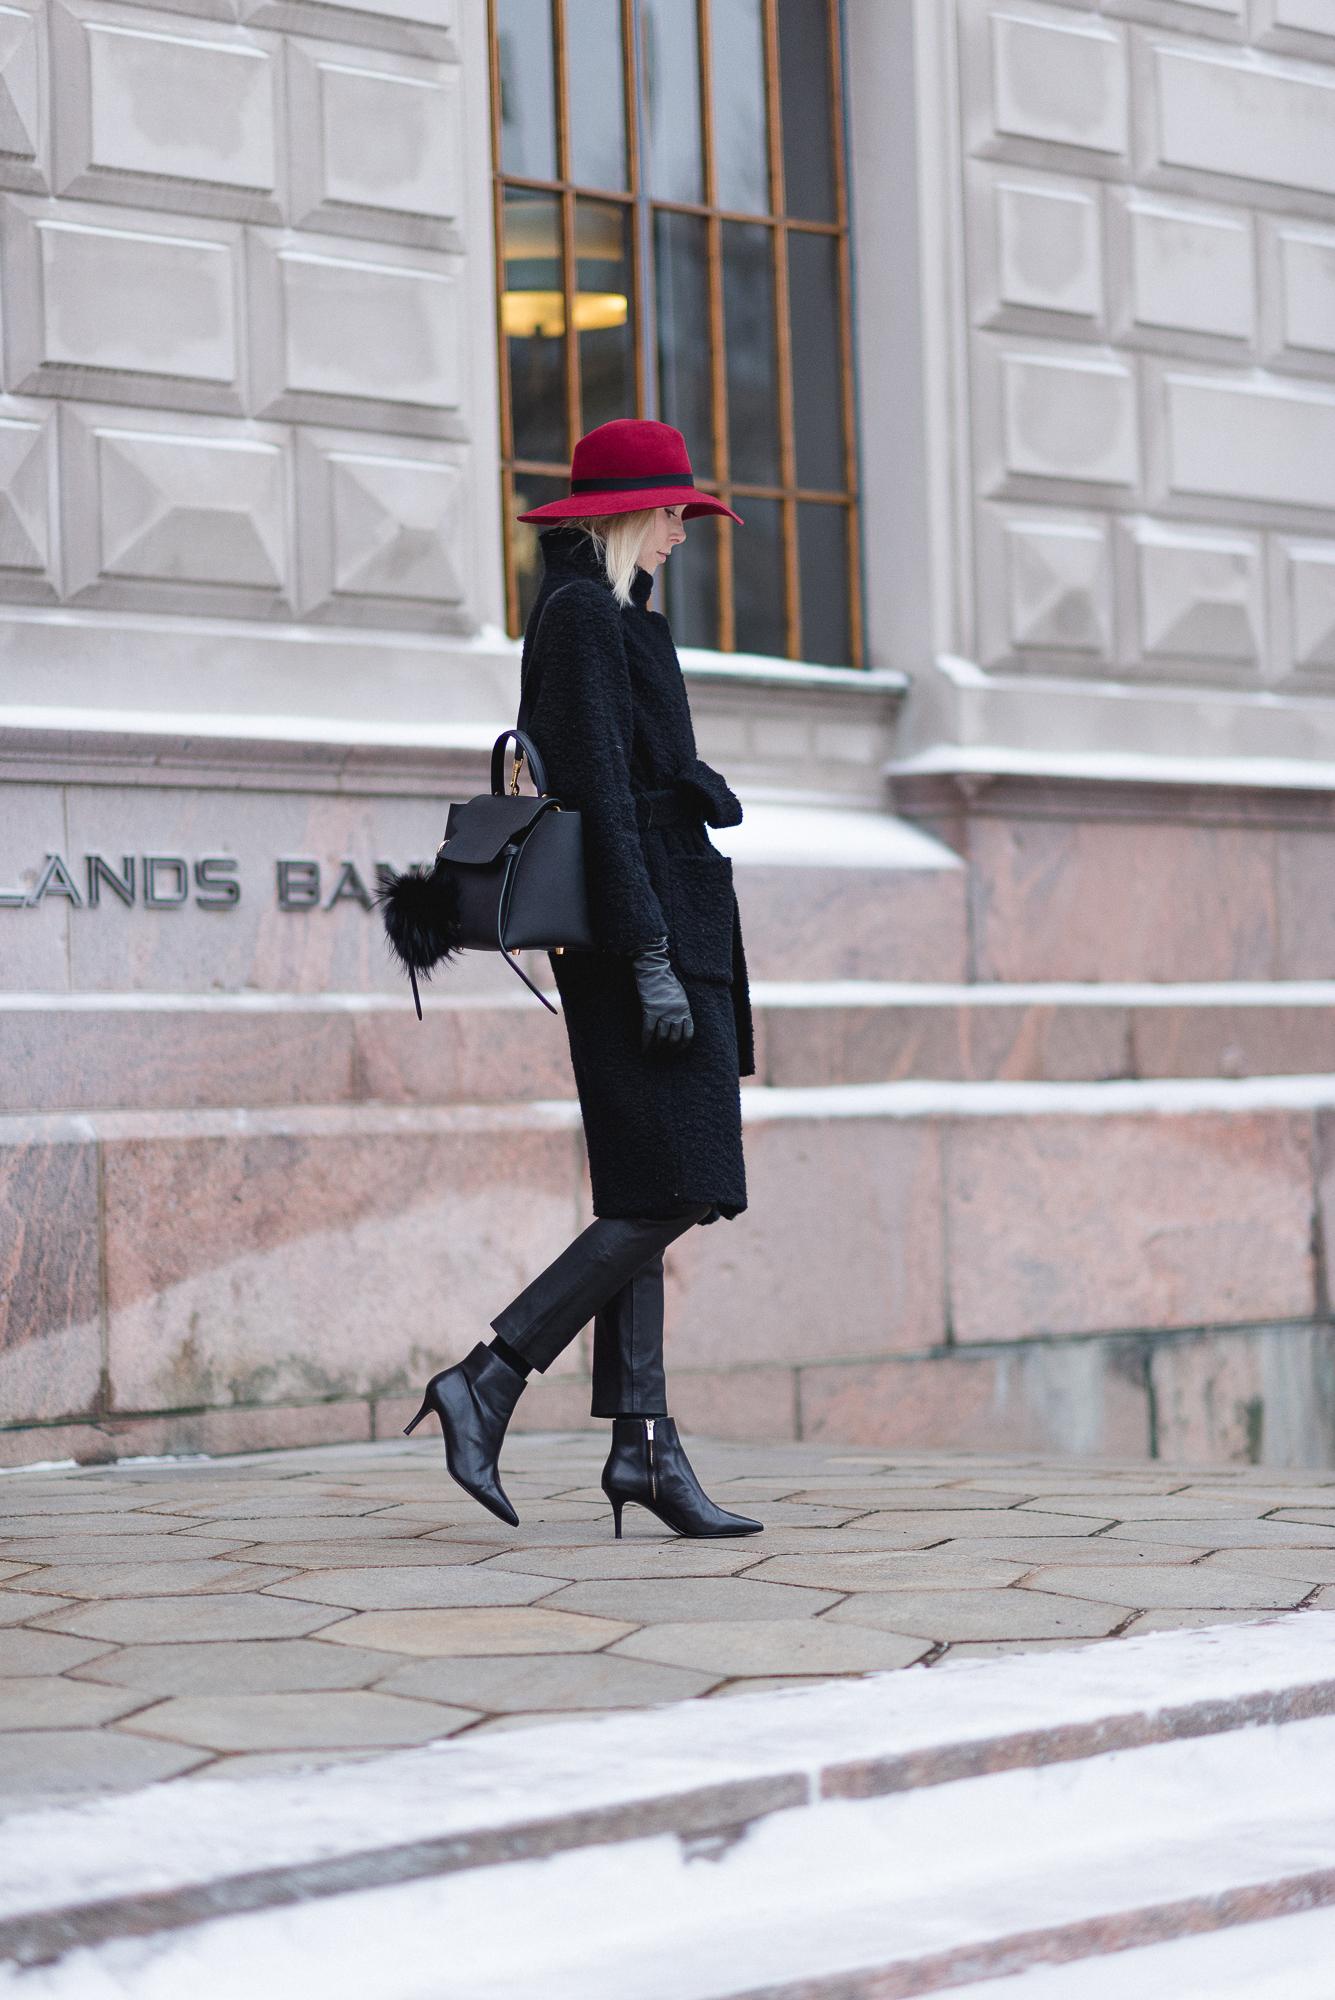 Anna-sofia-helsinki-snow-2